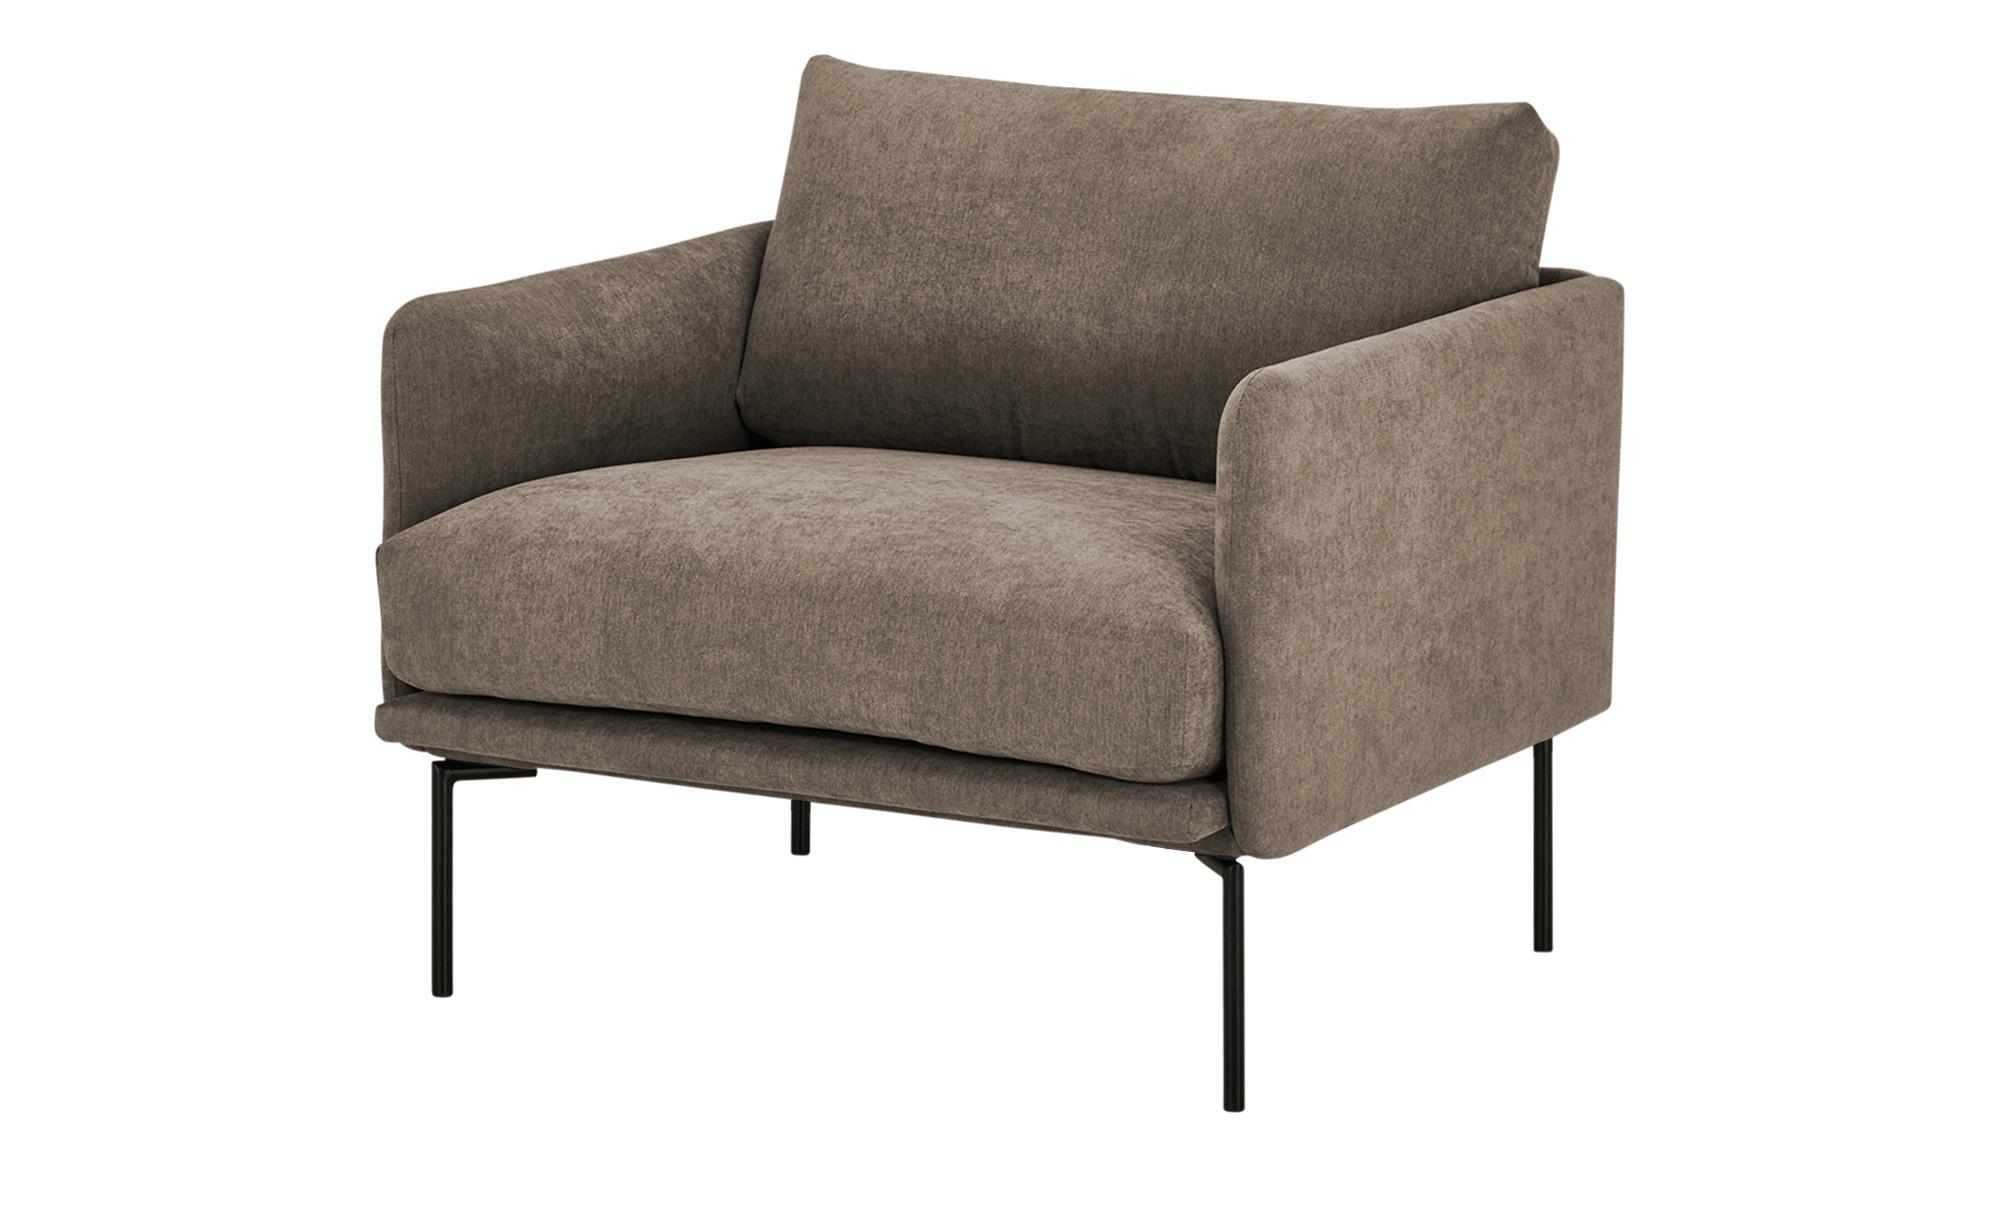 finya Sessel  Nora ¦ braun ¦ Maße (cm): B: 91 H: 78 T: 86 Polstermöbel > Sessel > Polstersessel - Höffner